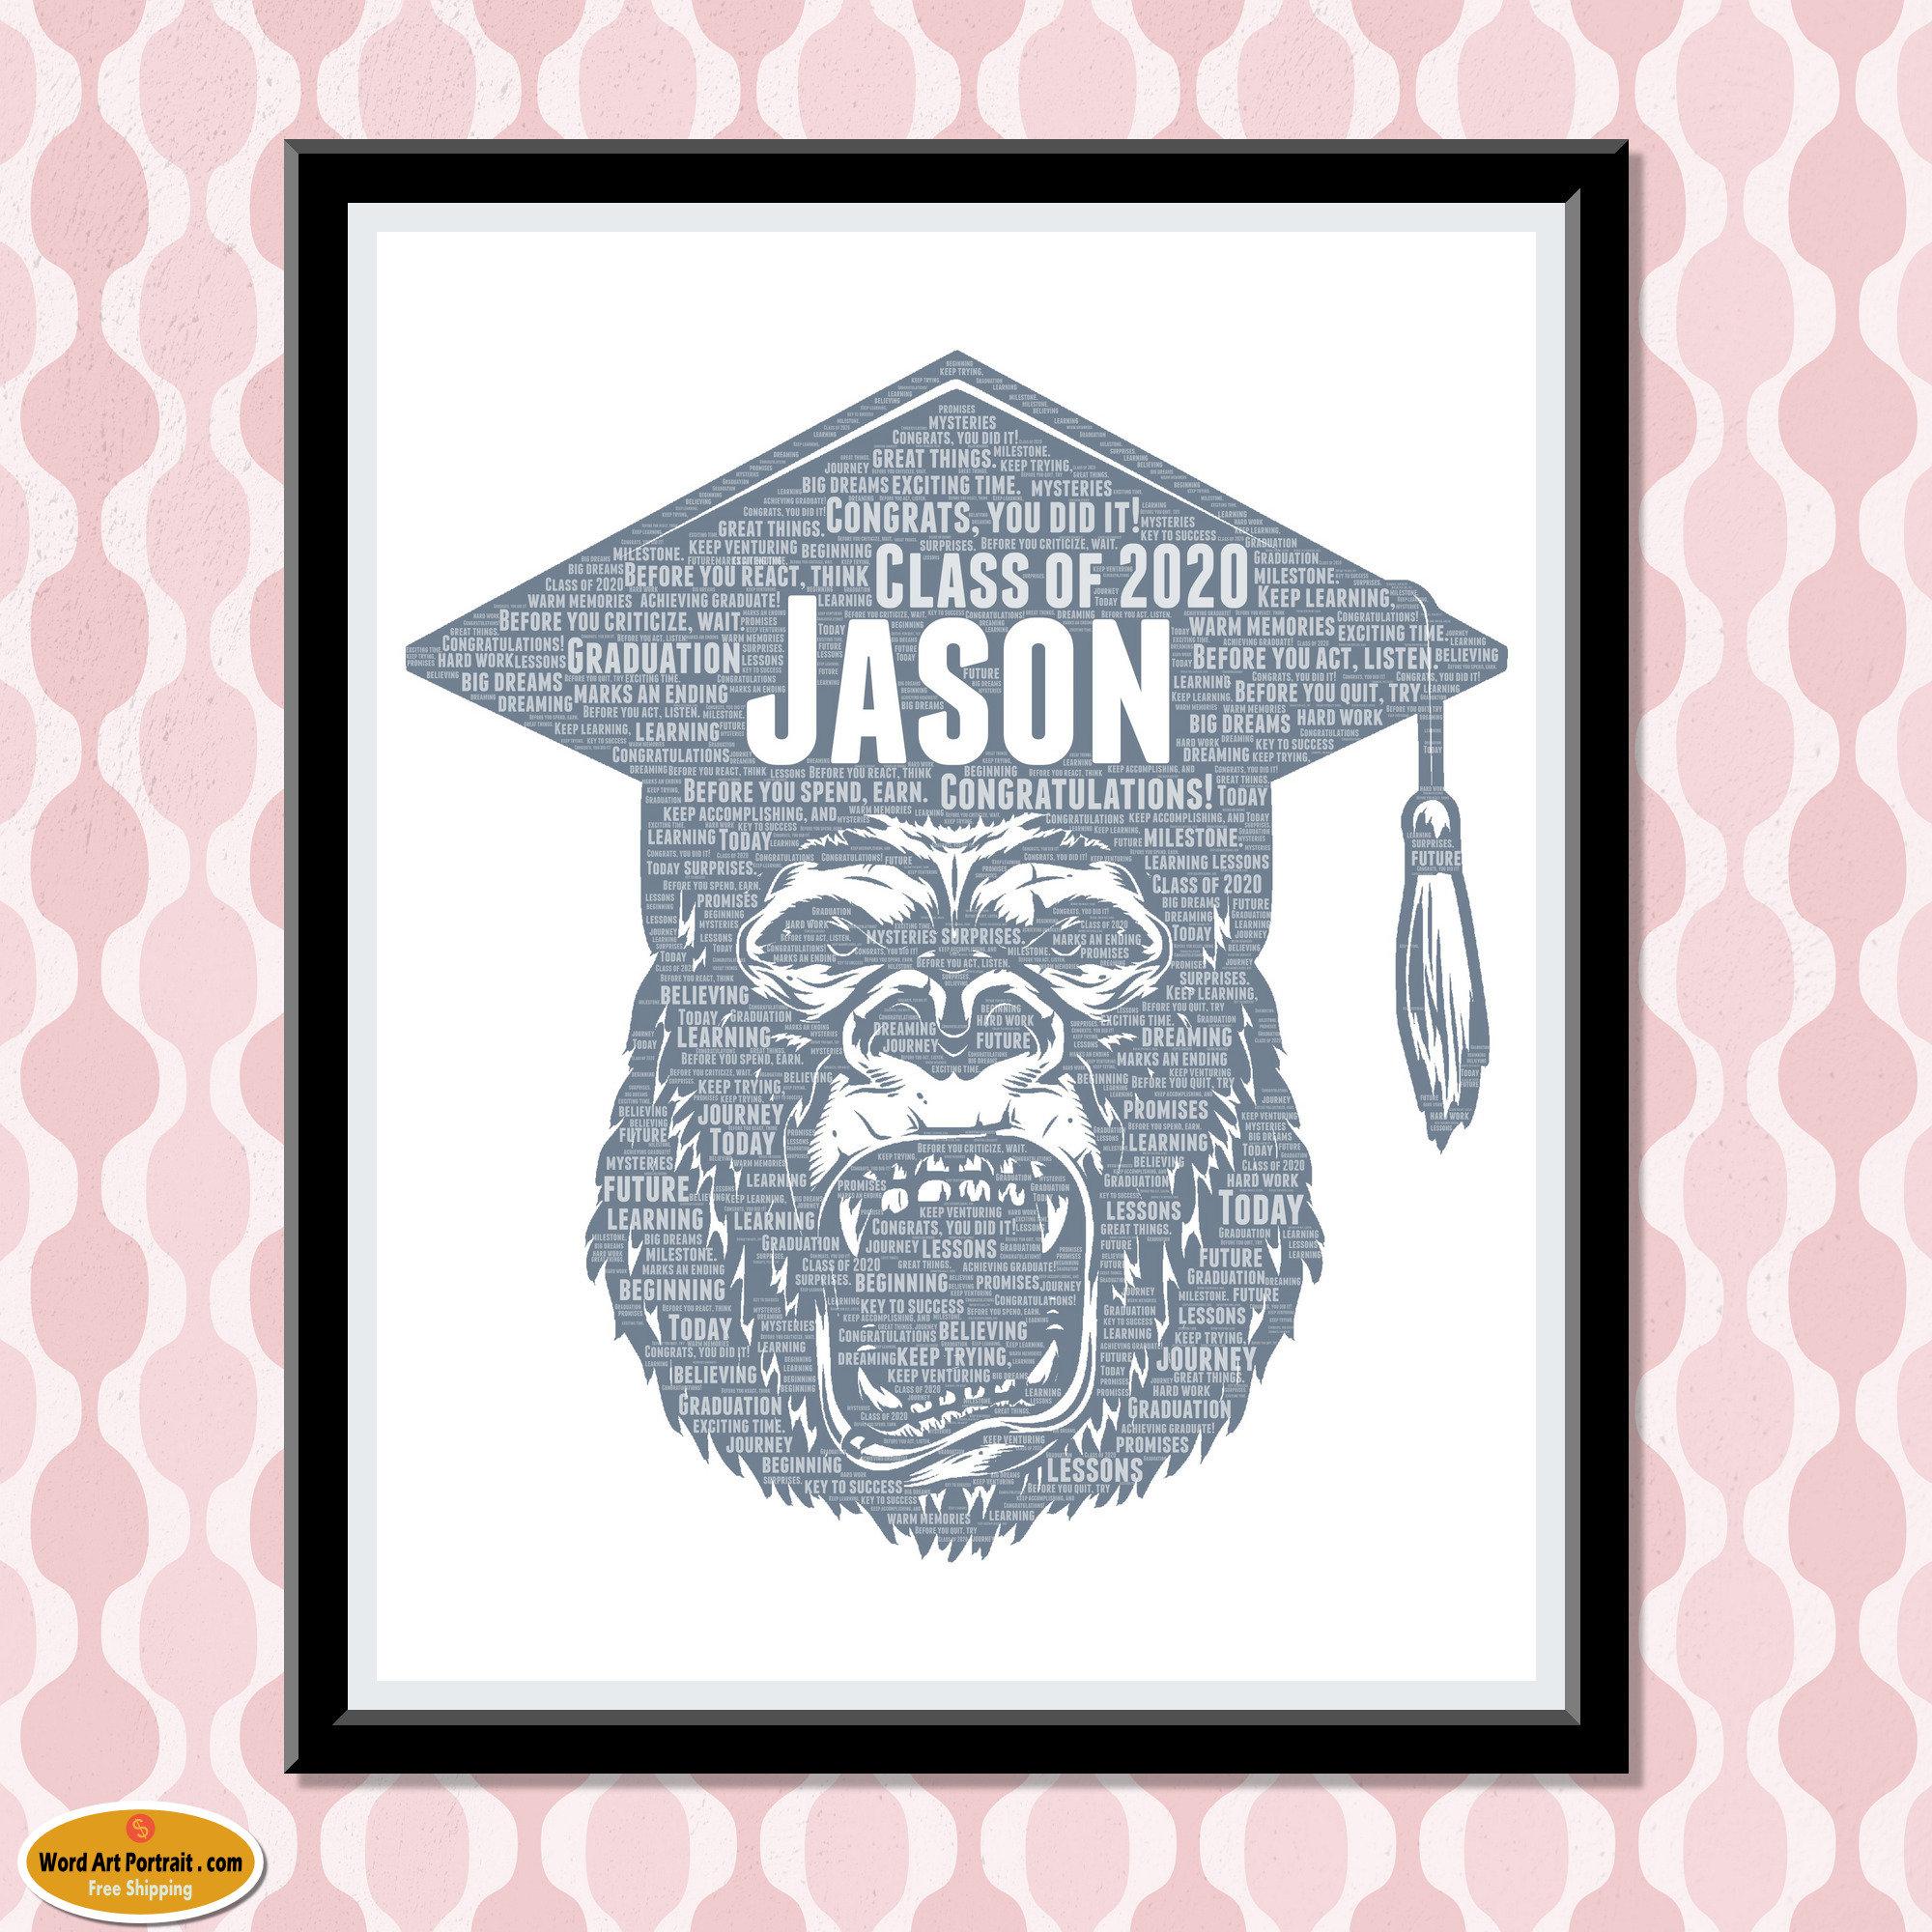 Class of 2020 Personalized Graduation Gifts Keepsake gifts for him Custom Print Wall Art College University Graduate Gift Word Art